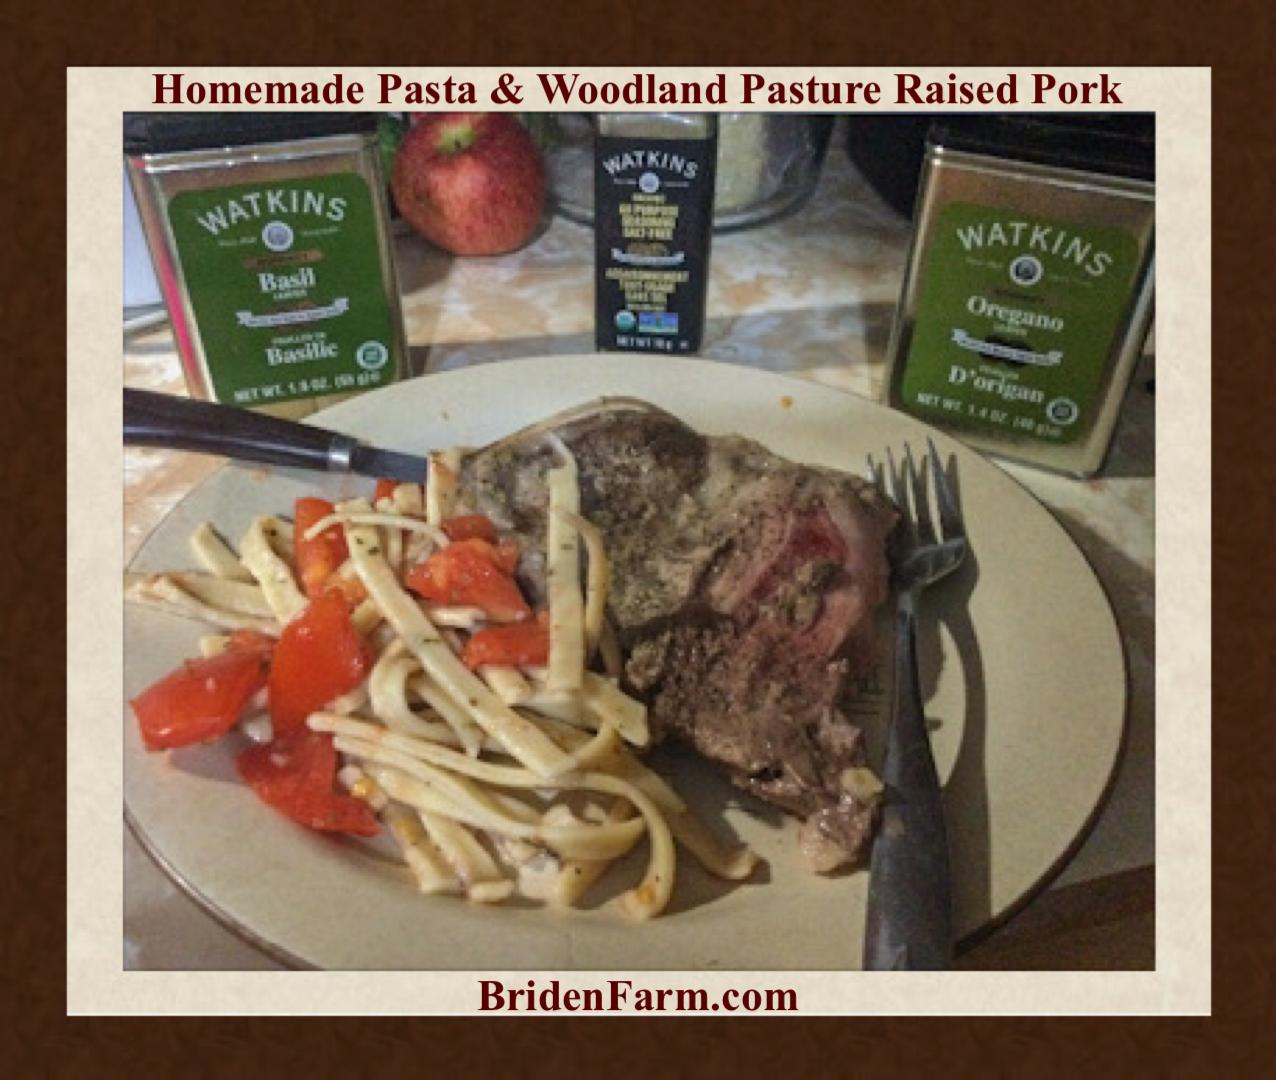 Homemade Pasta and Woodland Pasture Raised Pork